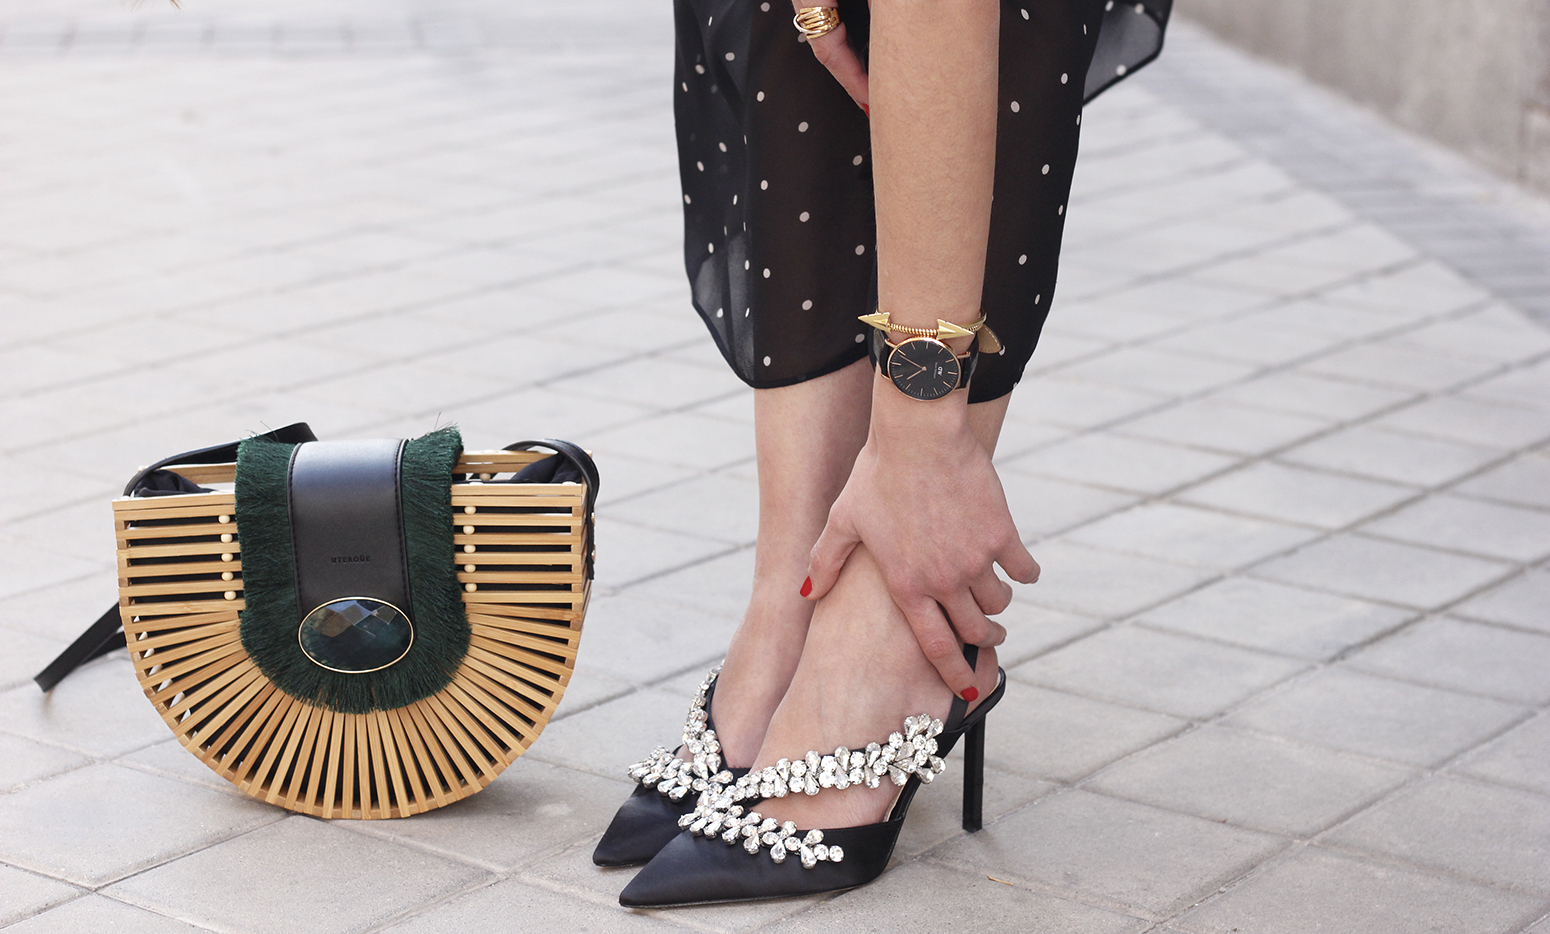 polka dot dress uterqüe jewel heels denim jacket outfit street style bamboo bag12